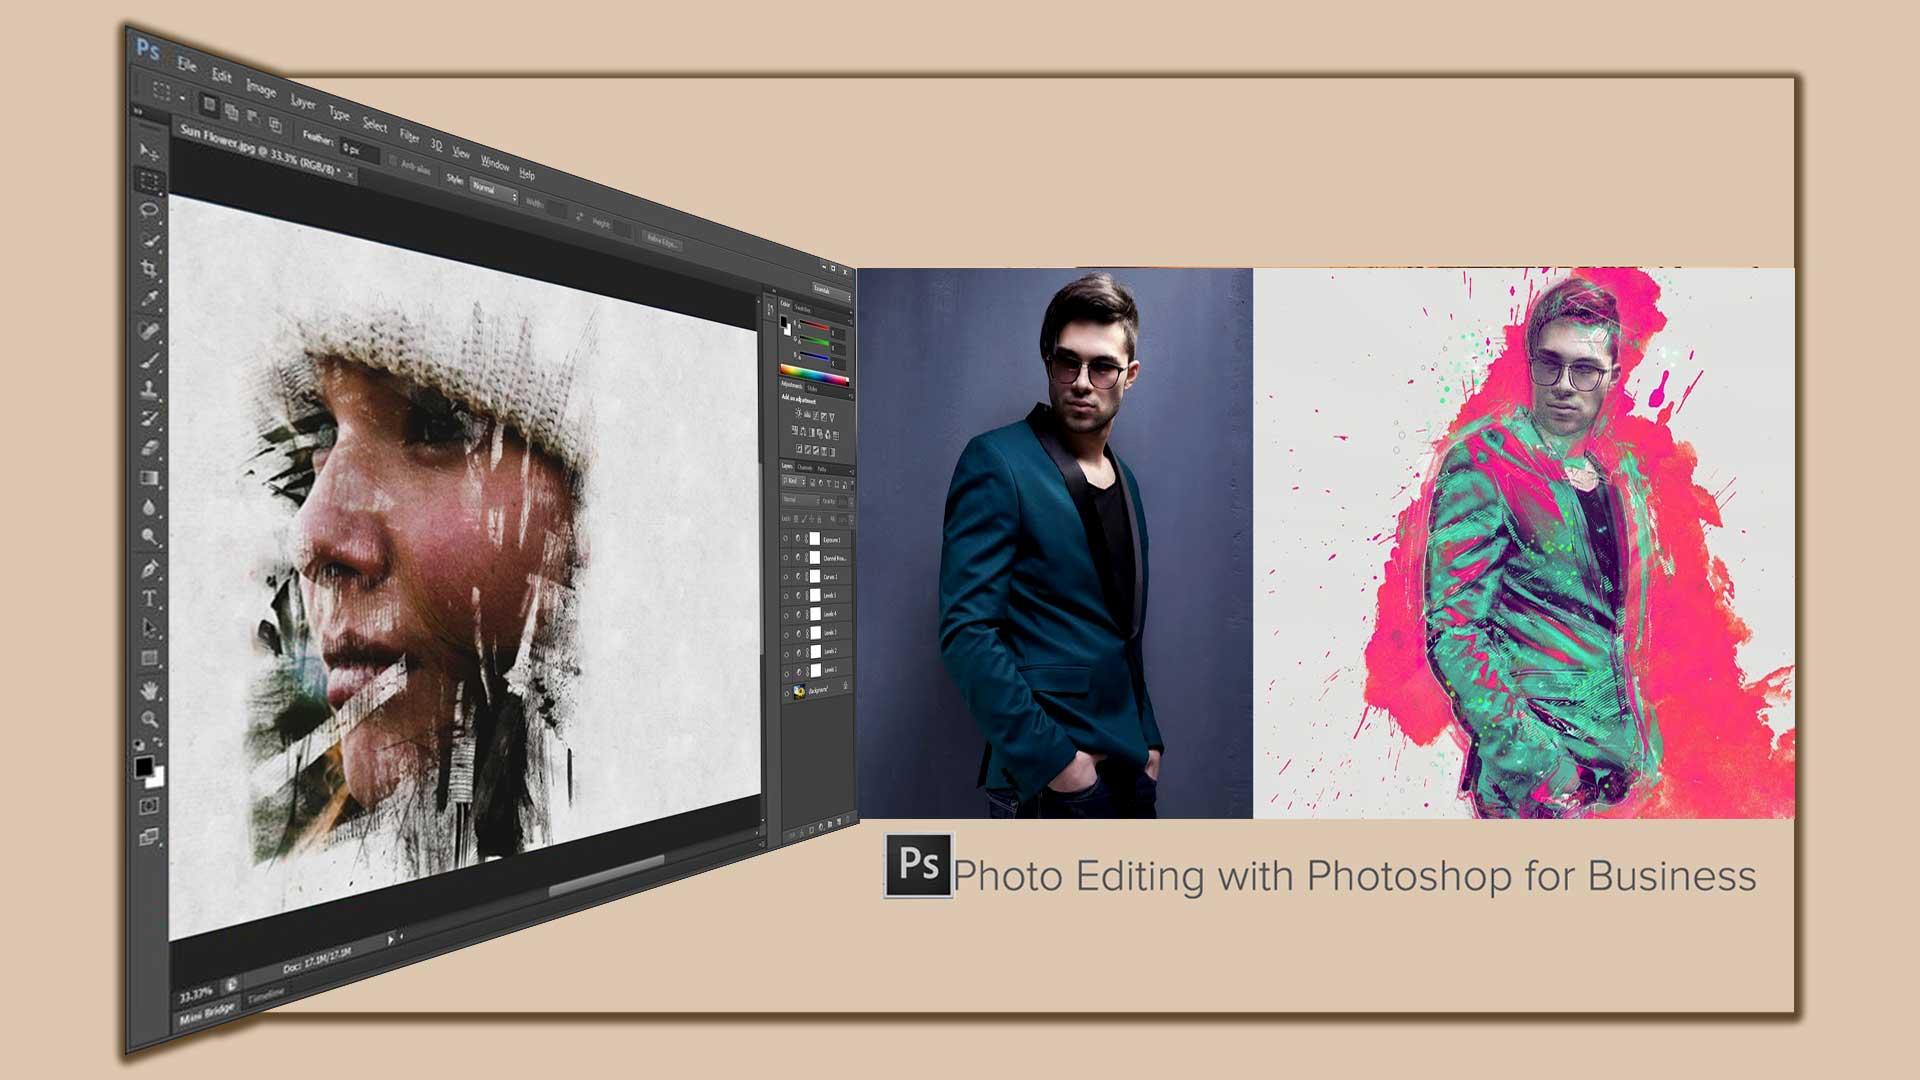 Photo editing  Photoshop 8 - 8 تا از مزایای اصلی ویرایش عکس با فتوشاپ برای کسب و کارتان